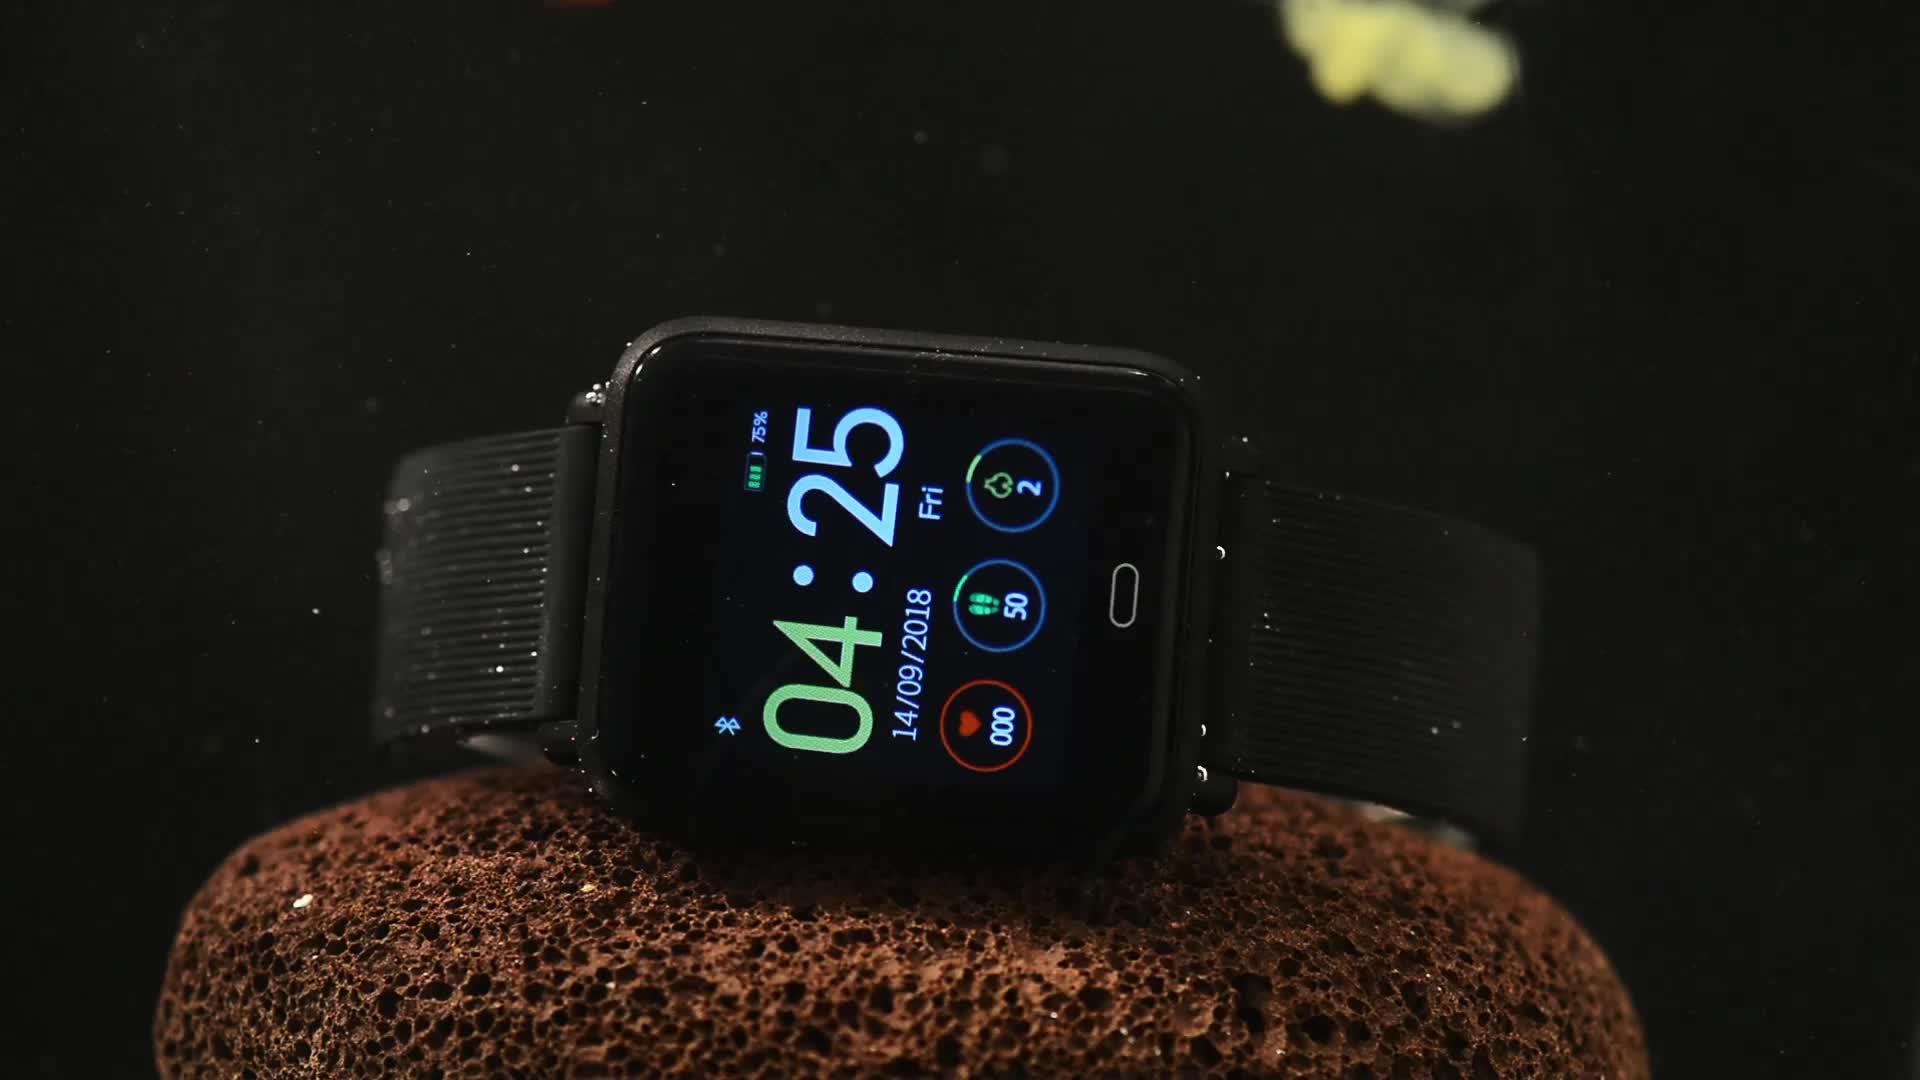 DOASAP Q9 Smartwatch Blood Pressure Heart Rate Sleep Monitor IP67  Waterproof Sport Fitness Tracker Watch Smart watch Shenzhen, View Q9  Smartwatch,